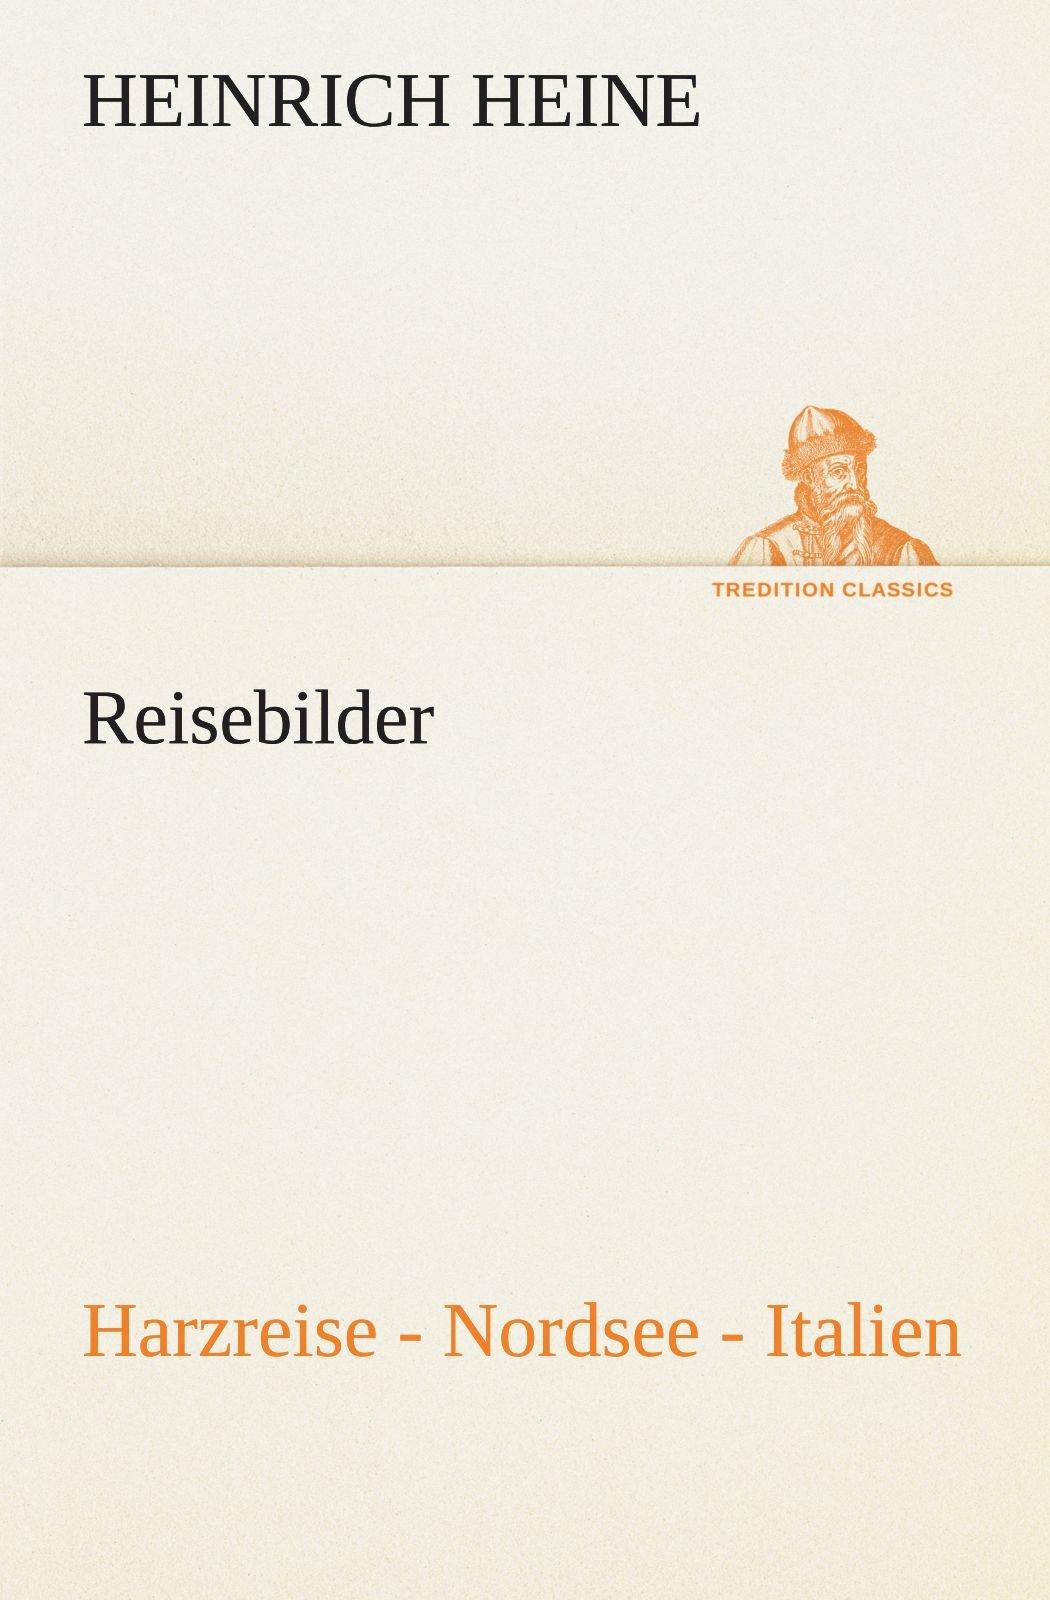 Reisebilder. Harzreise - Nordsee - Italien (TREDITION CLASSICS) (German Edition) PDF